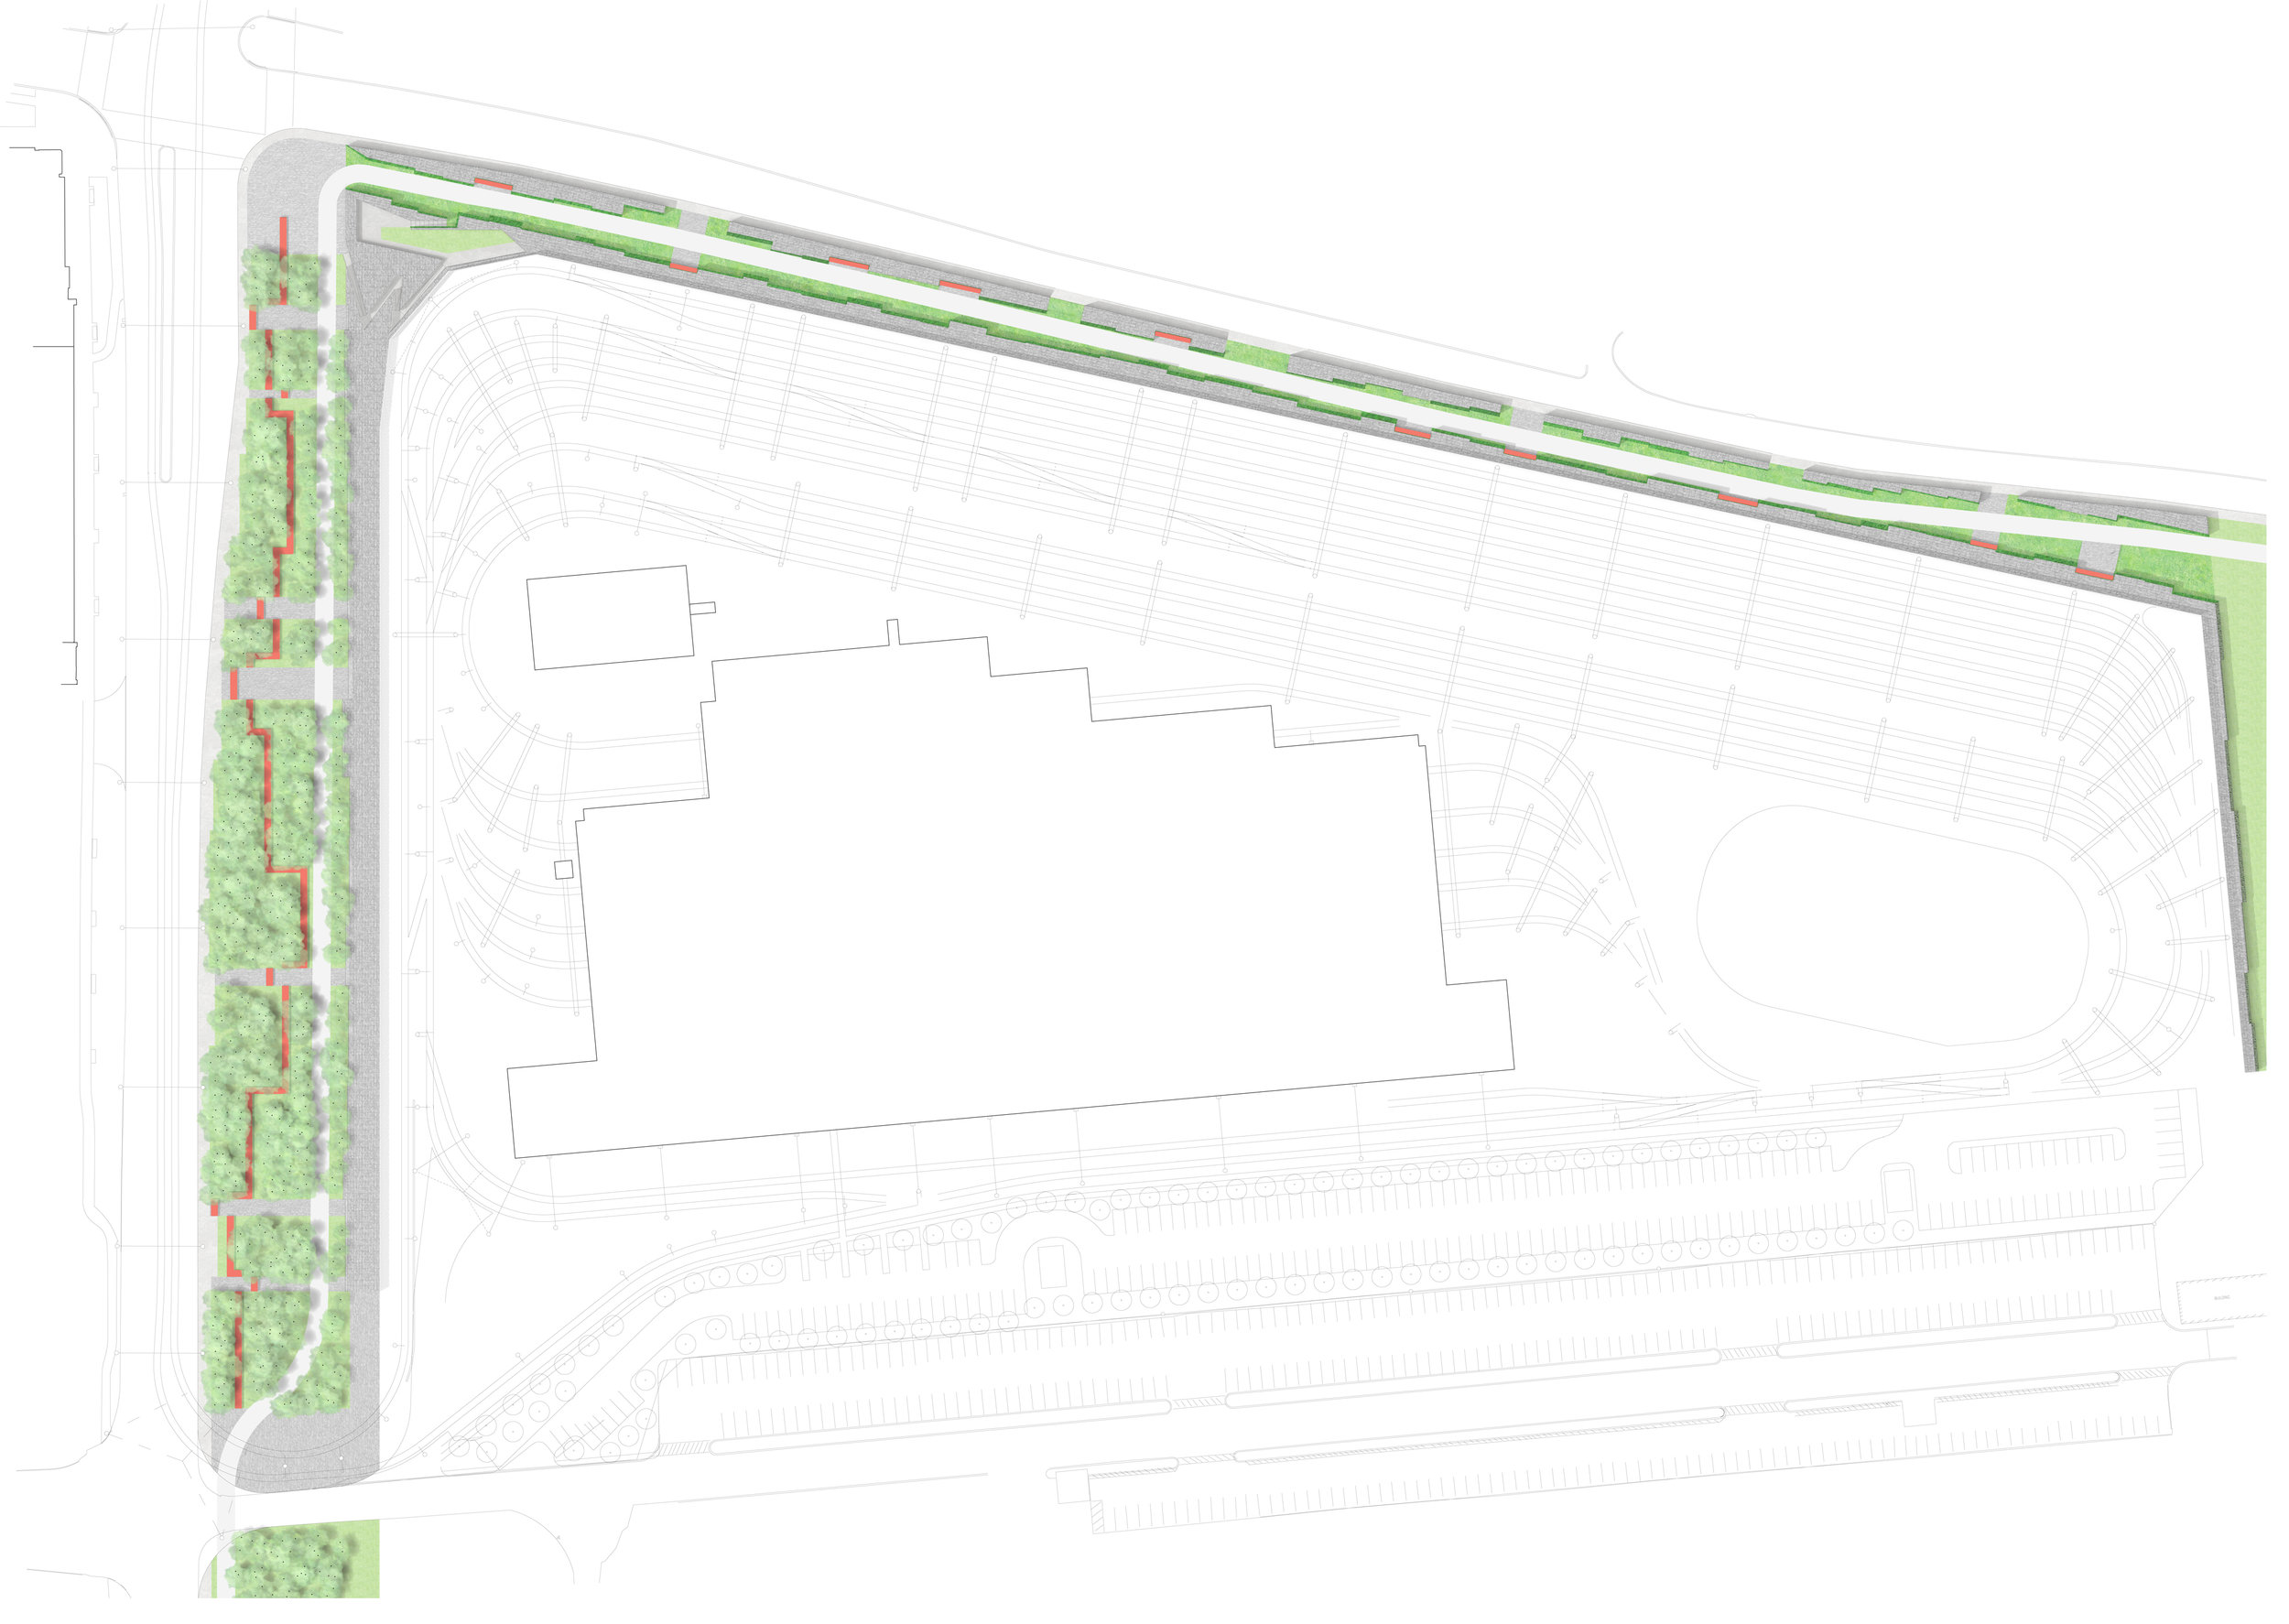 PLAN 1-500 2m - revised.jpg